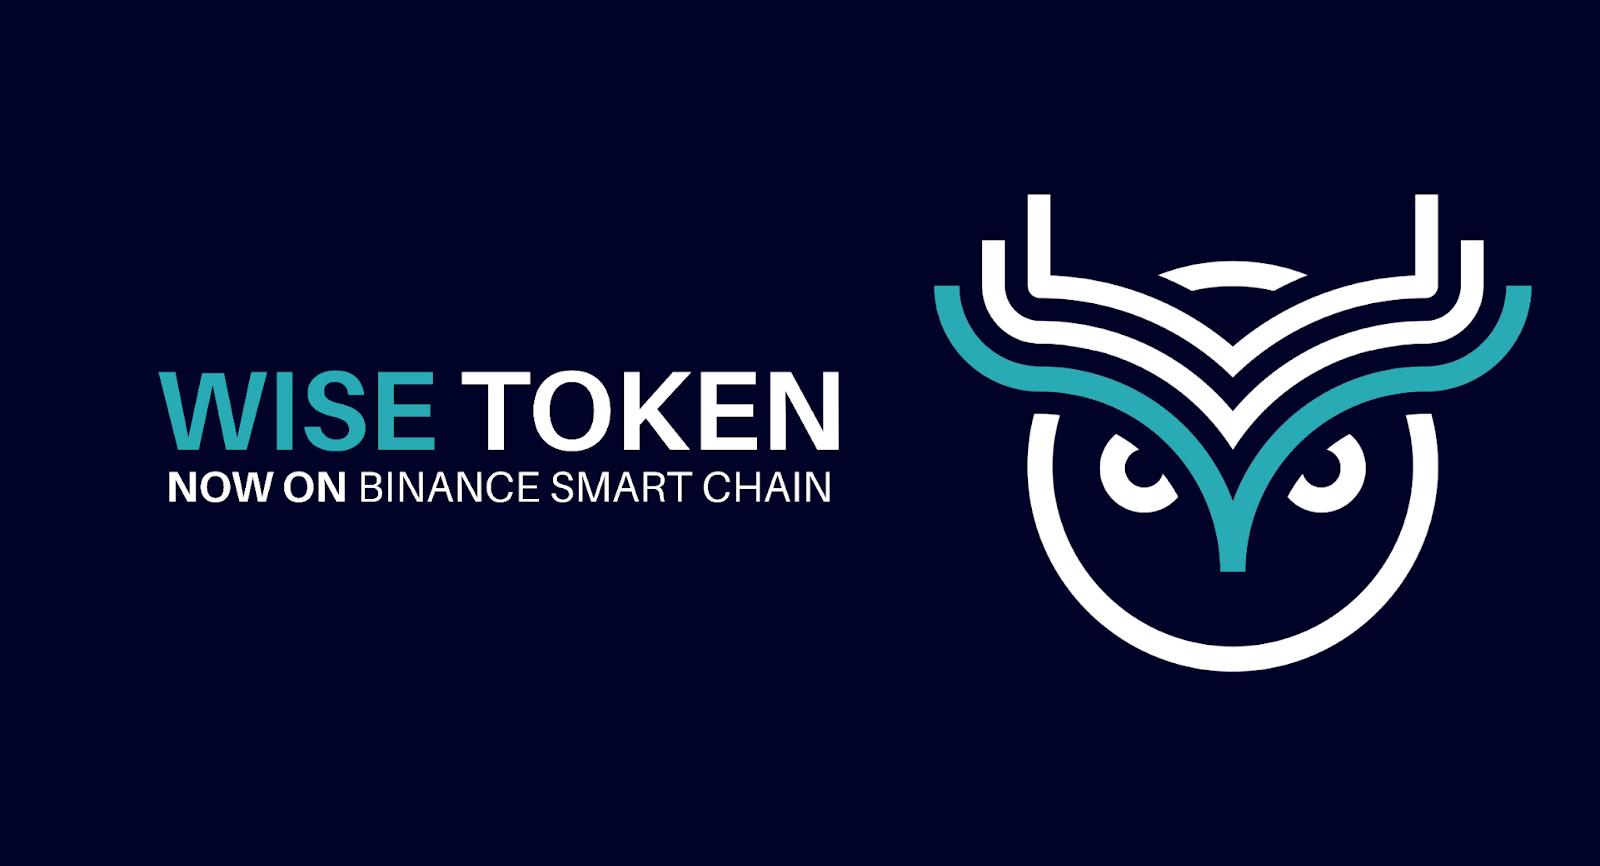 Wise Token joins Binance Smart Chain